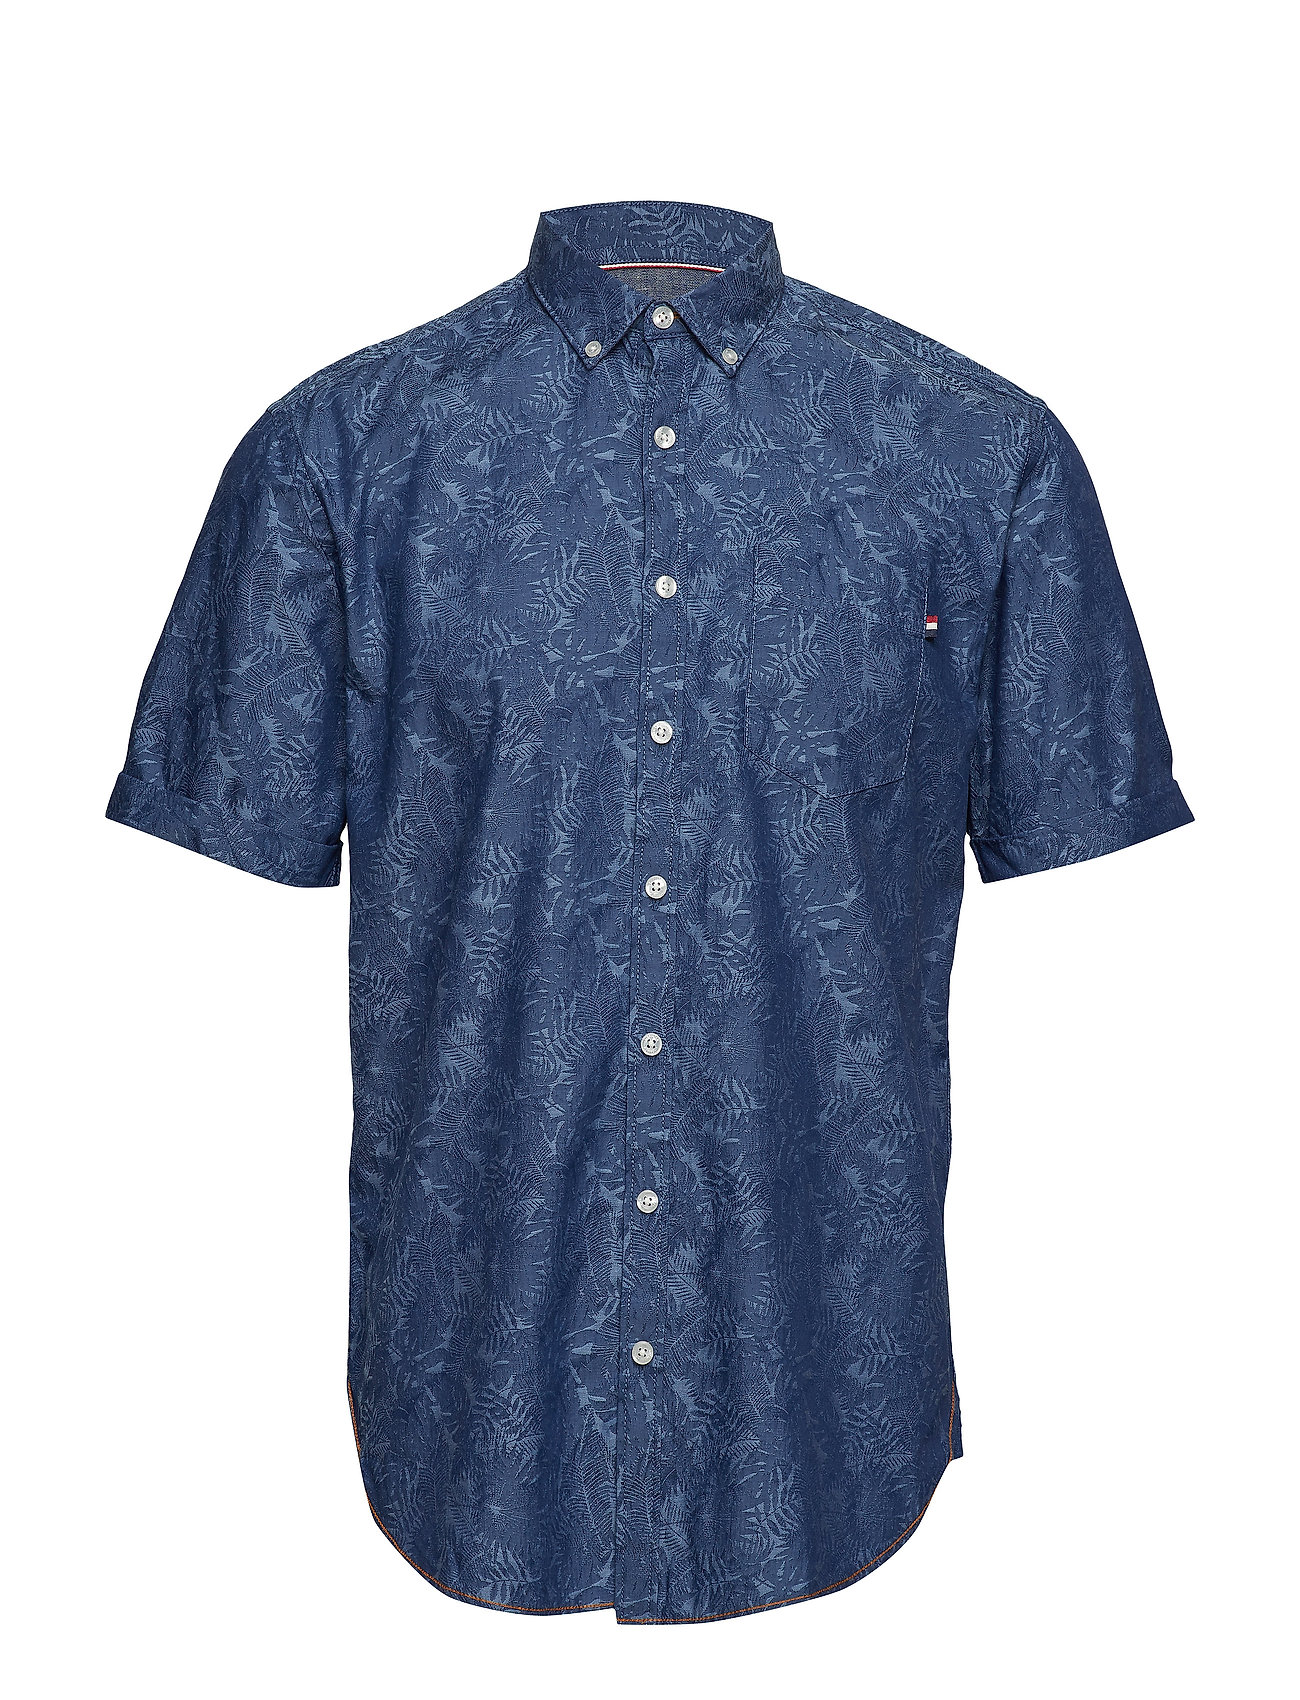 Lindbergh Jacquard shirt S/S - BLUE